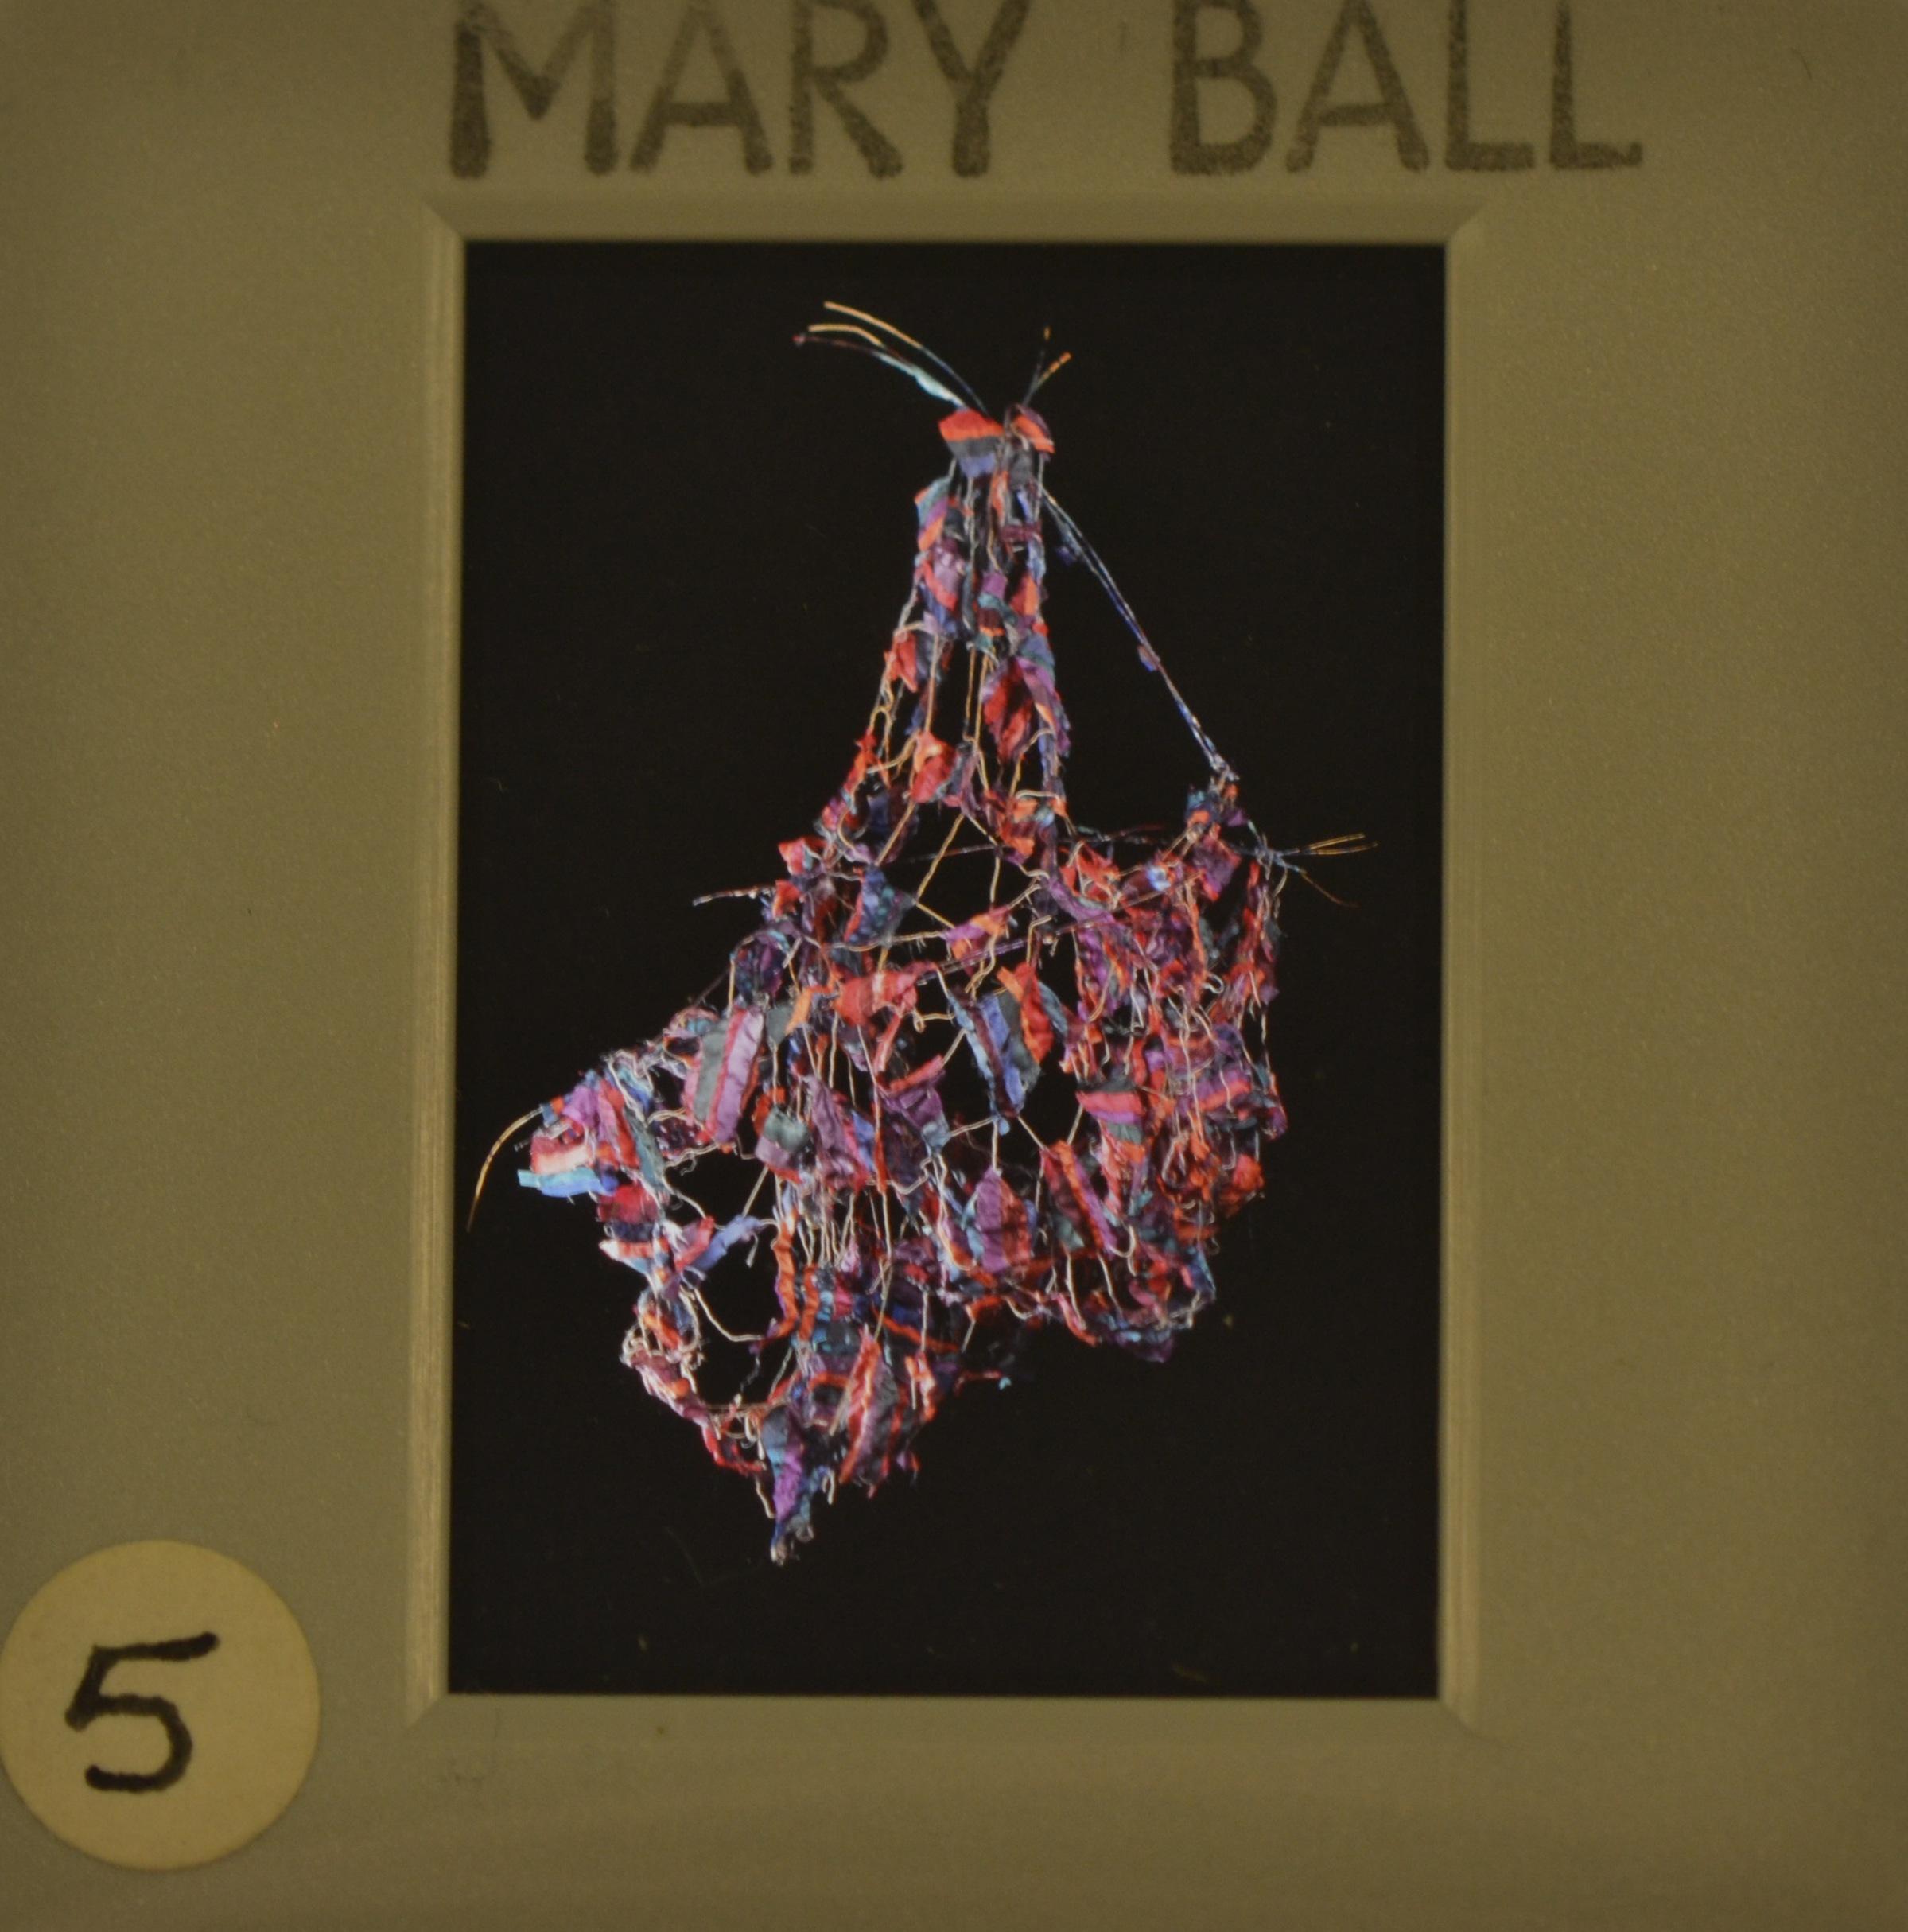 MARY BALL S2001.jpg